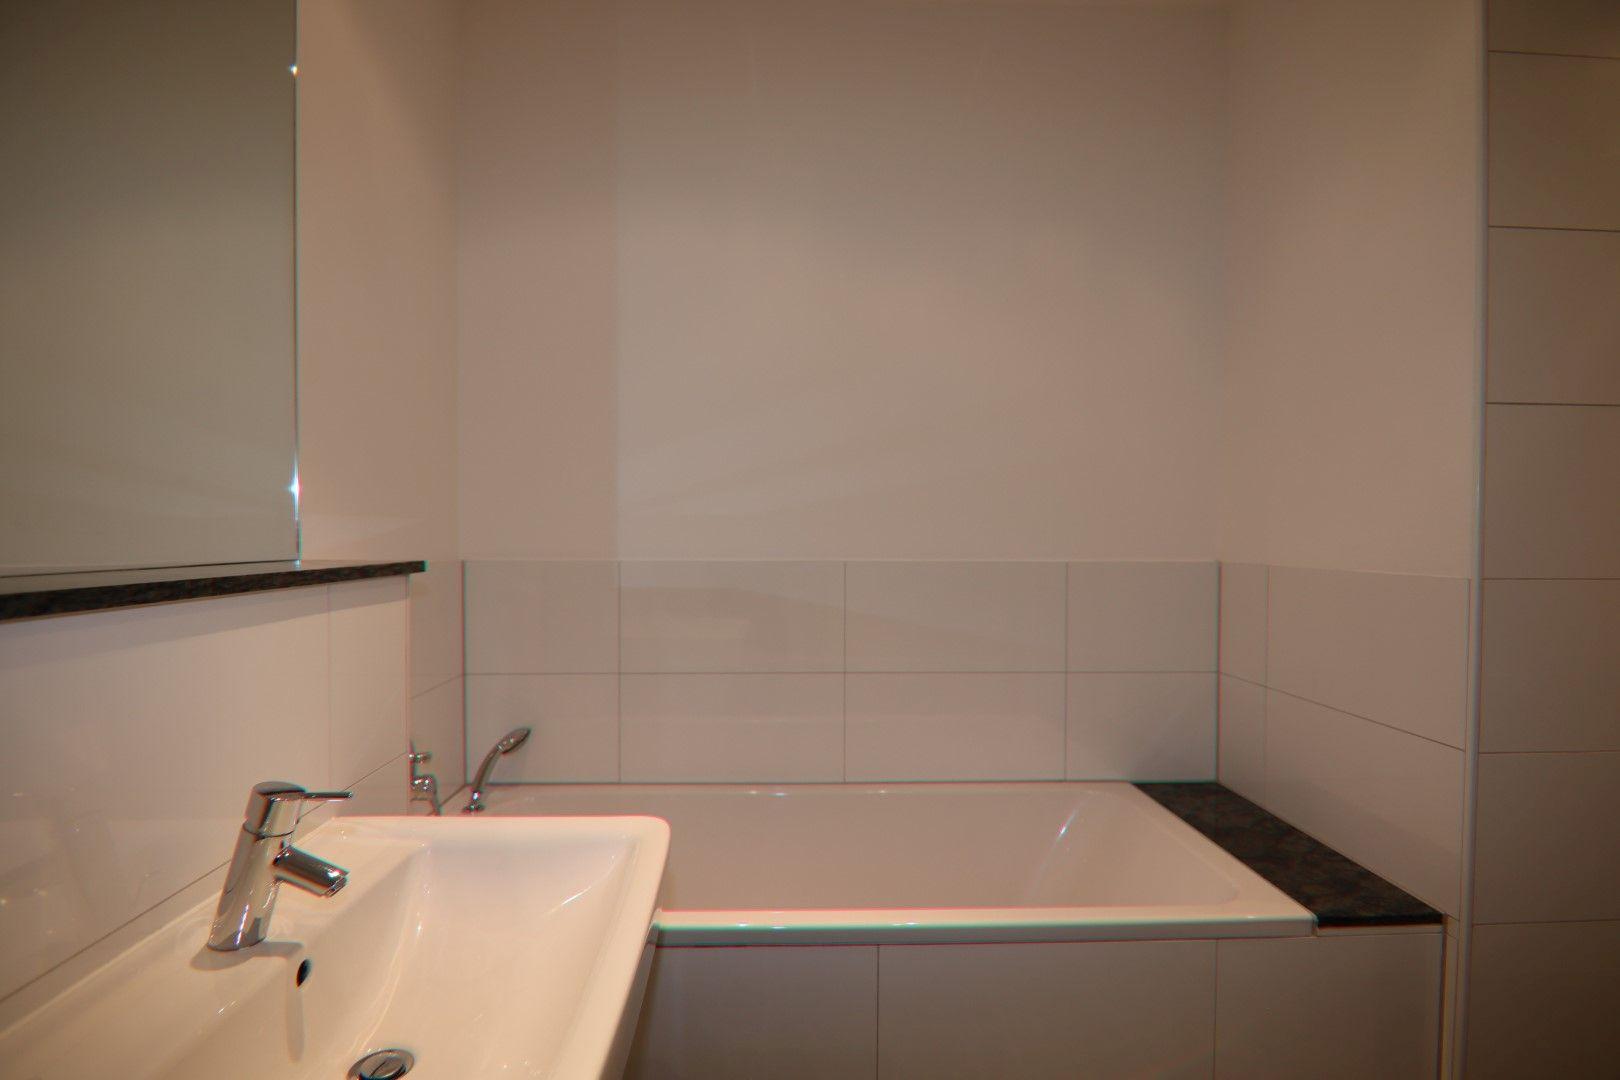 Immobilie Nr.0271 - 3-Zimmer-Altbauwohnung mit Aufzug im 3.OG - Bild 7.jpg